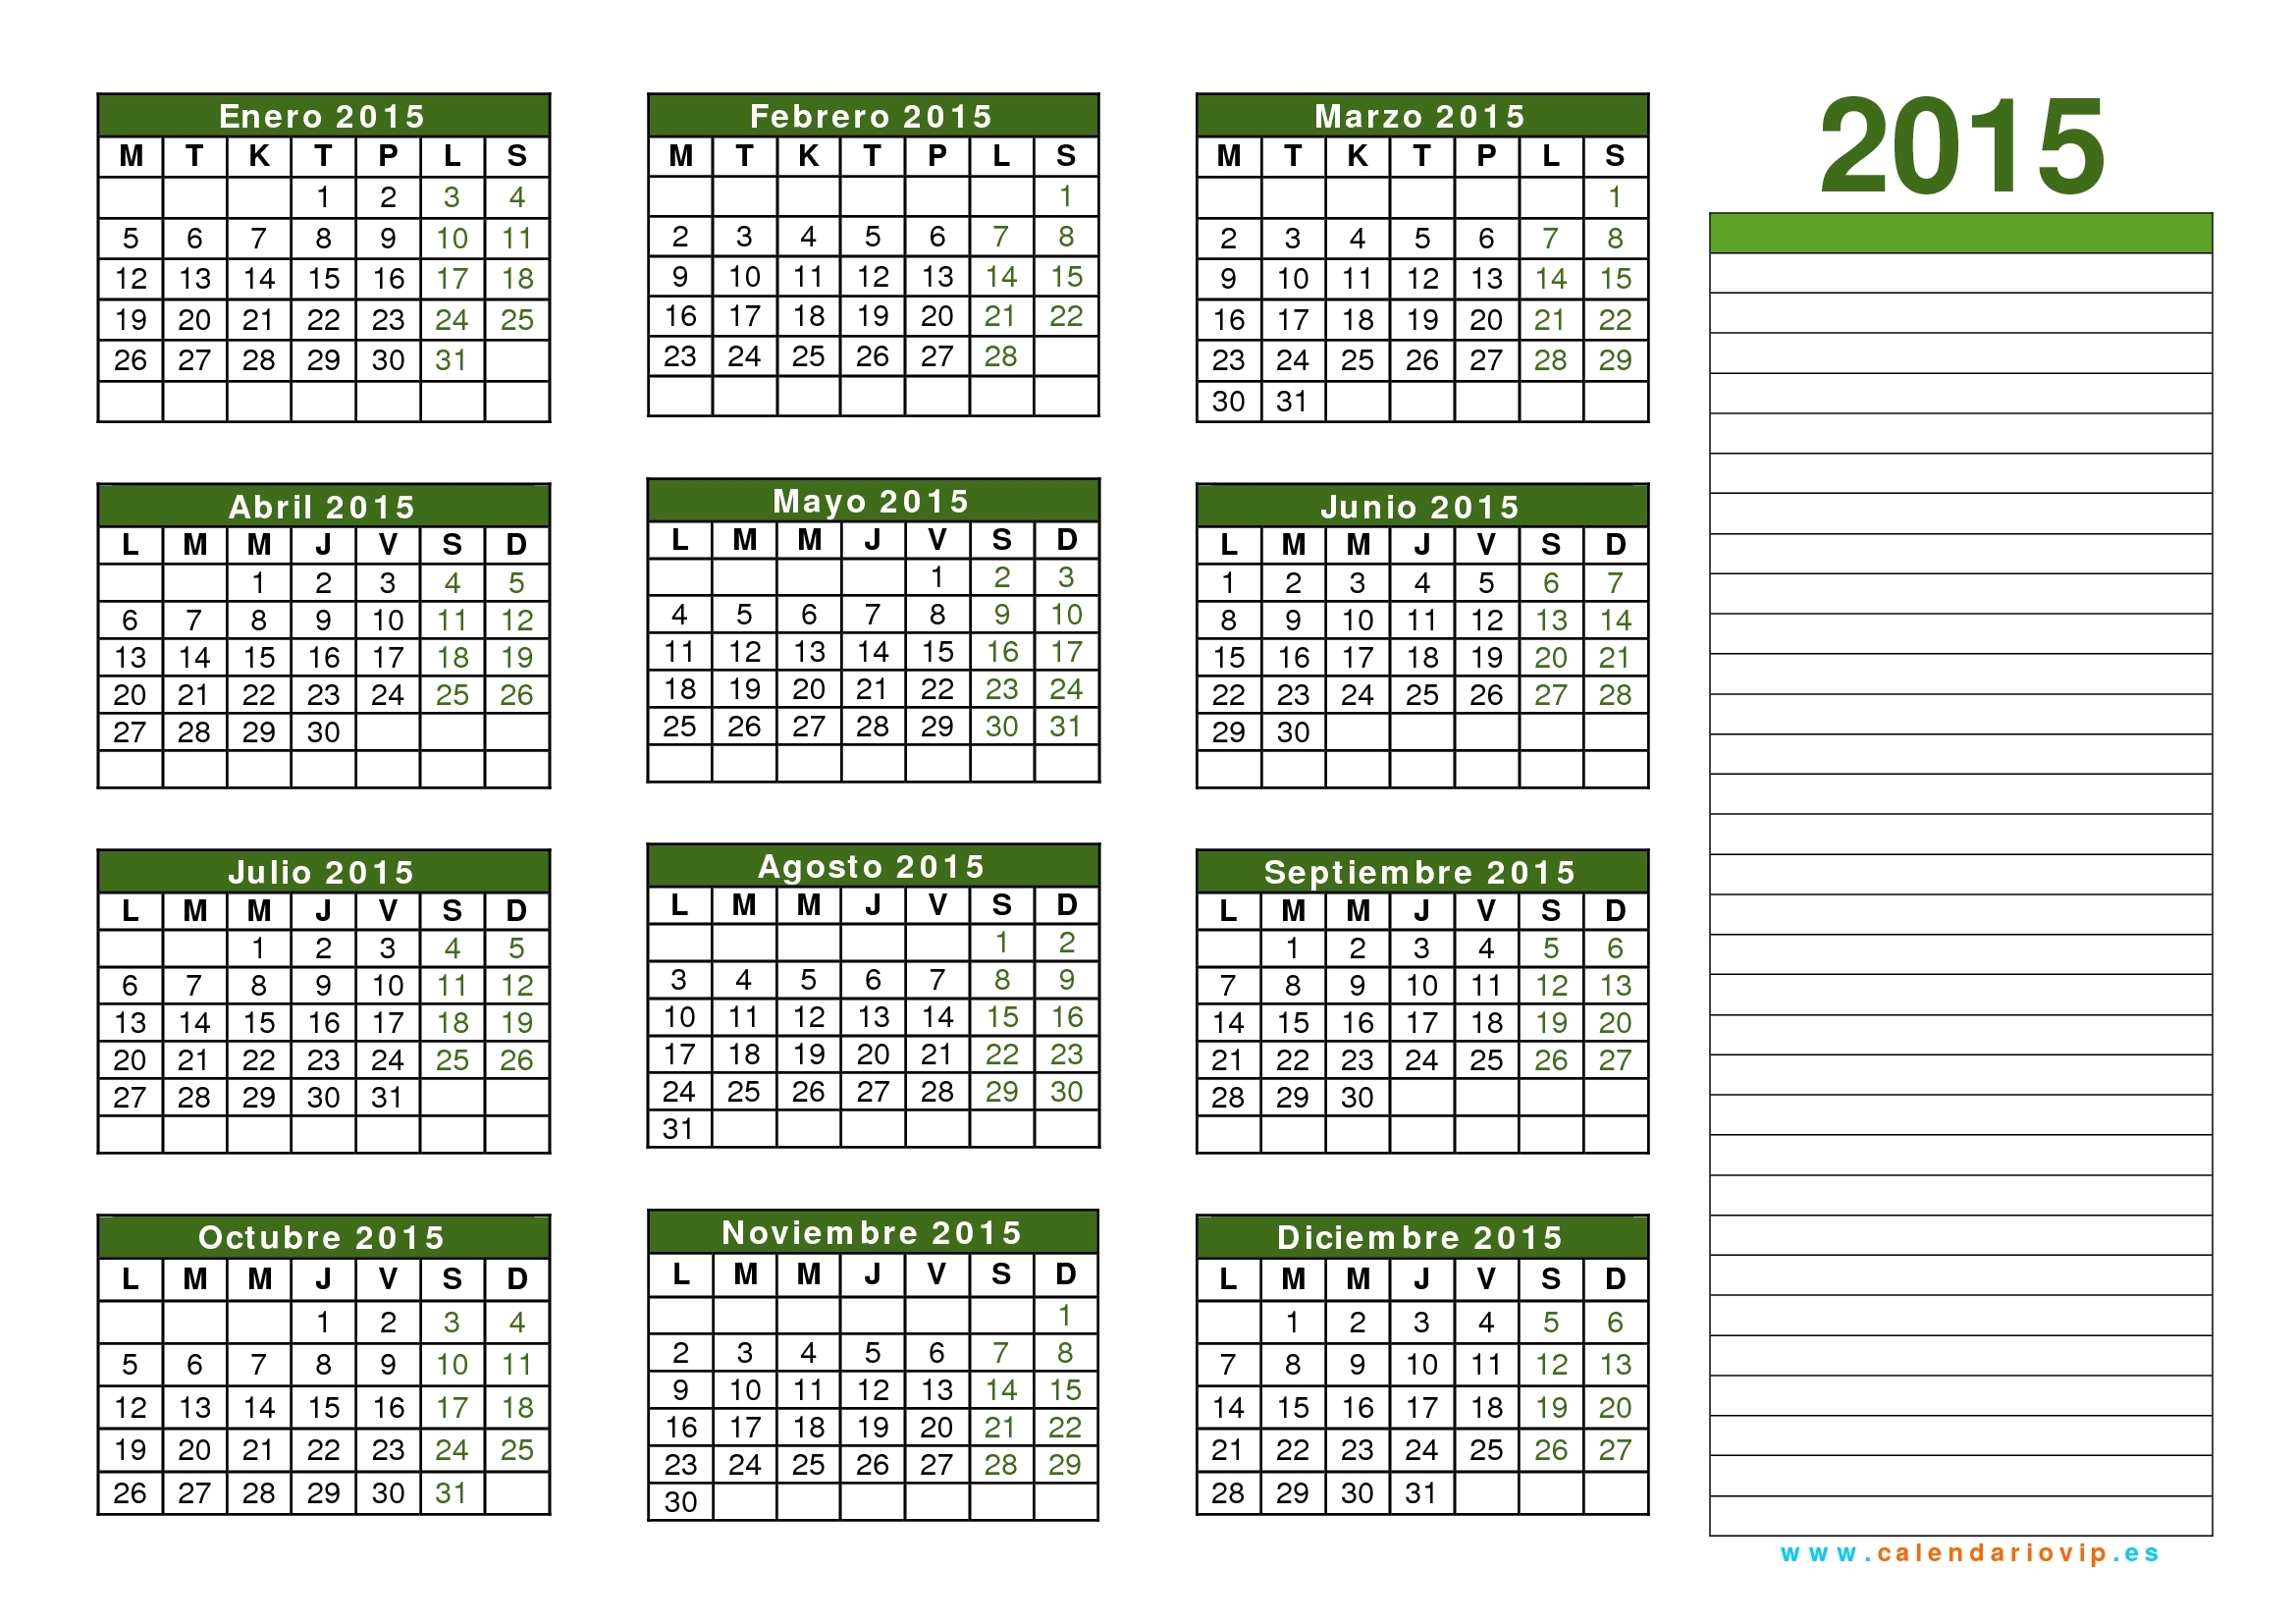 Calendario 2015 Para Imprimir Gratis throughout Calendario 2015 Para Imprimir Pdf